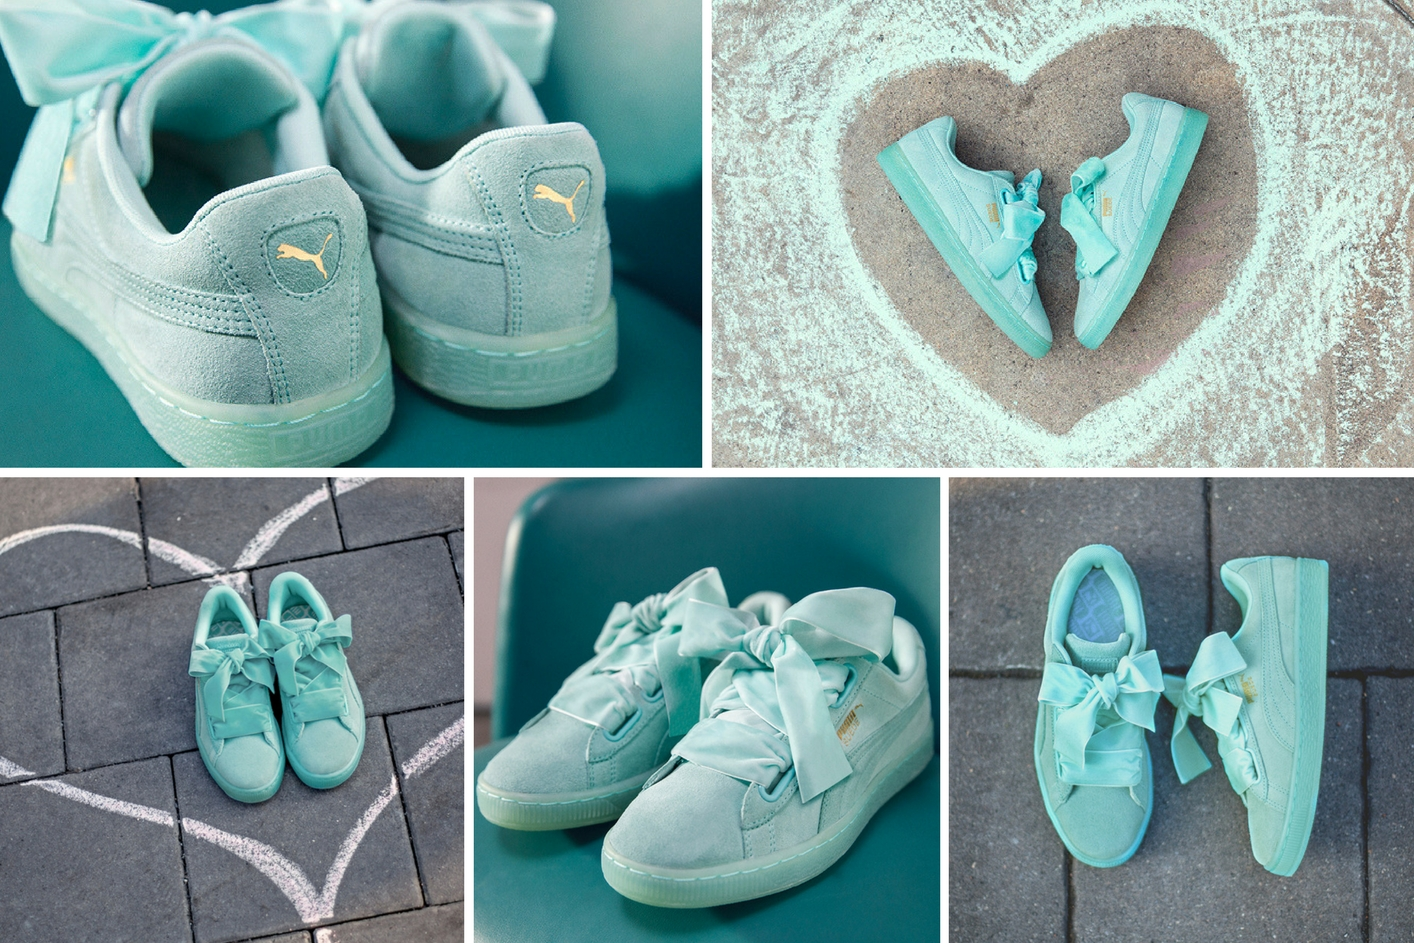 scarpe puma donna 2017 azzurre